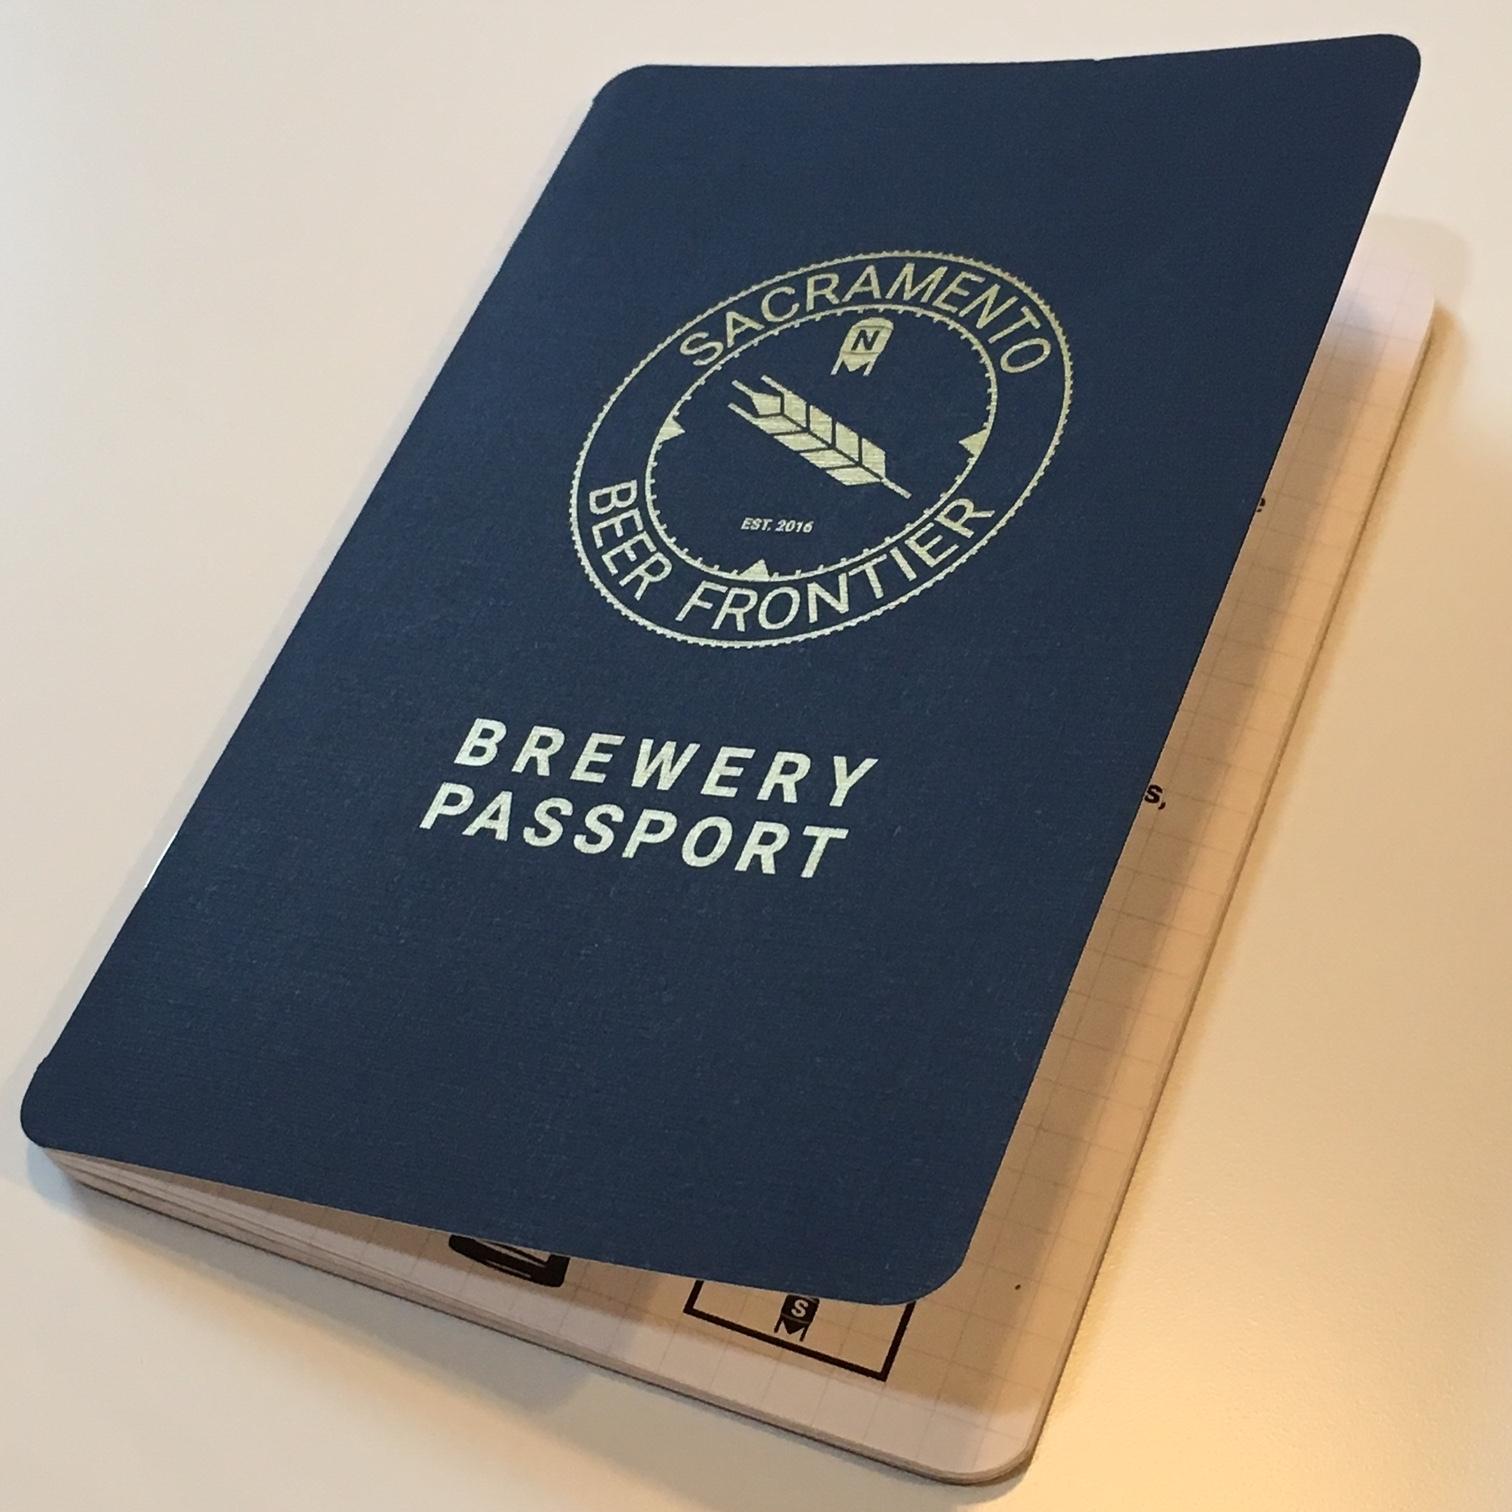 Brewery Passport.JPG